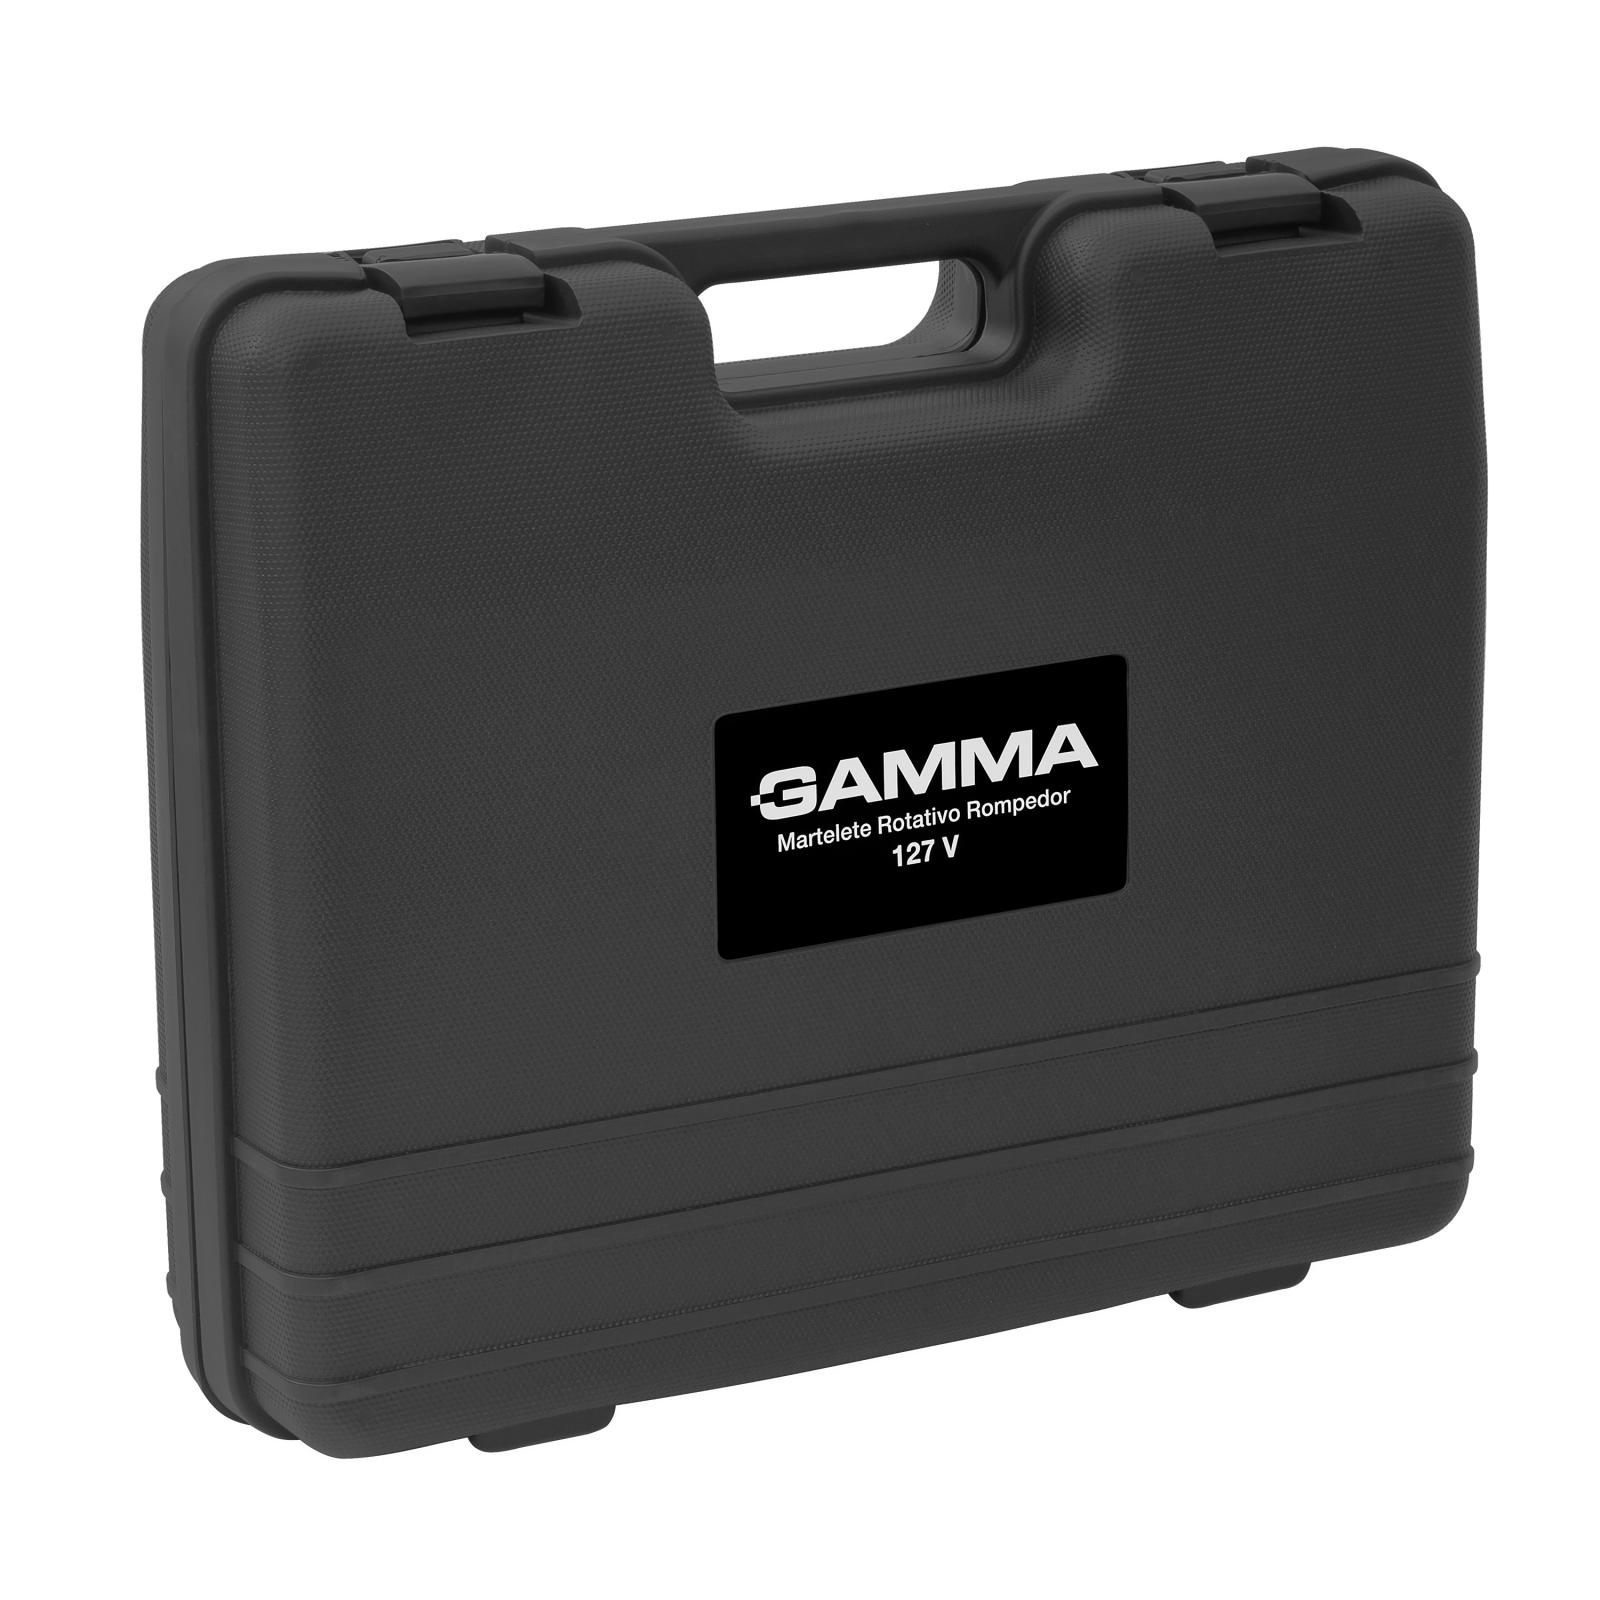 Martelete Rotativo Rompedor Gamma 1500w Mandril Sds G1951 - Ferramentas MEP